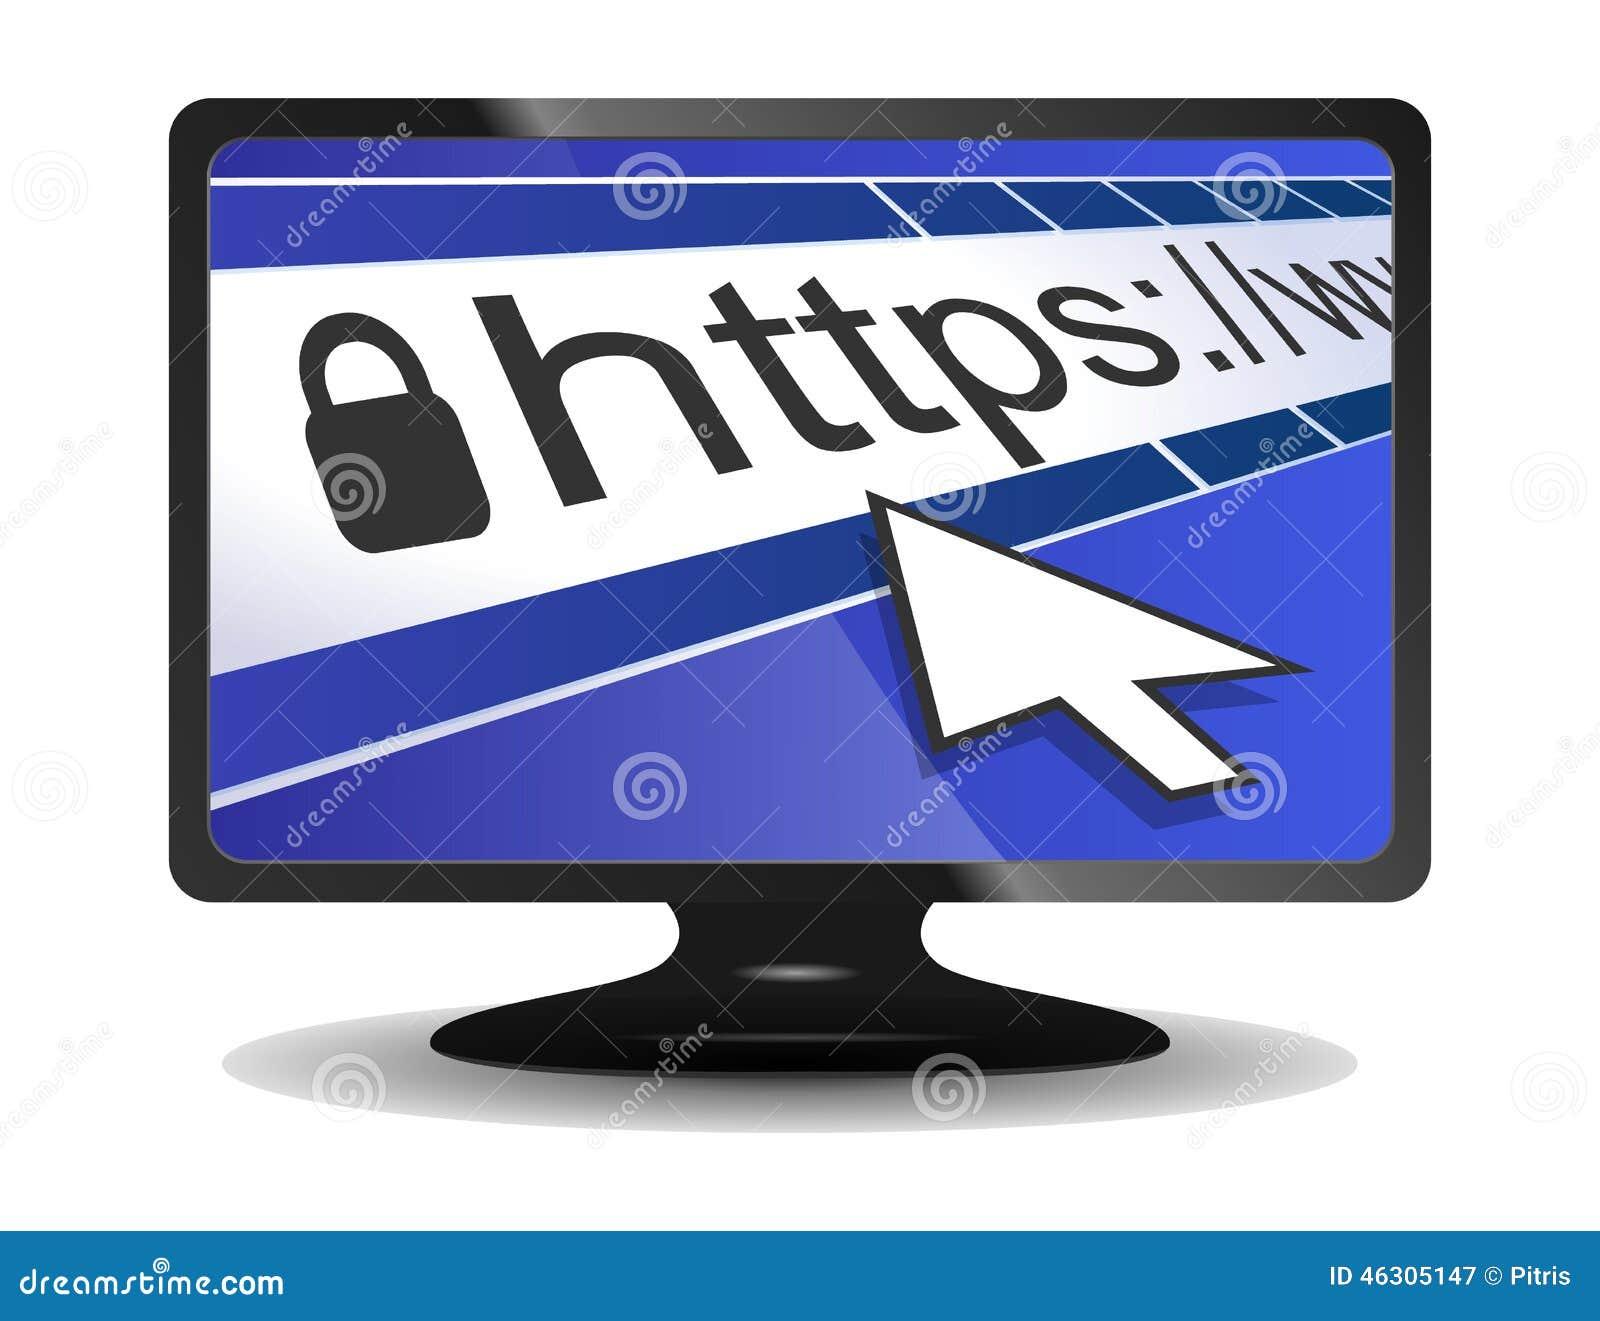 Browser Adresszeile